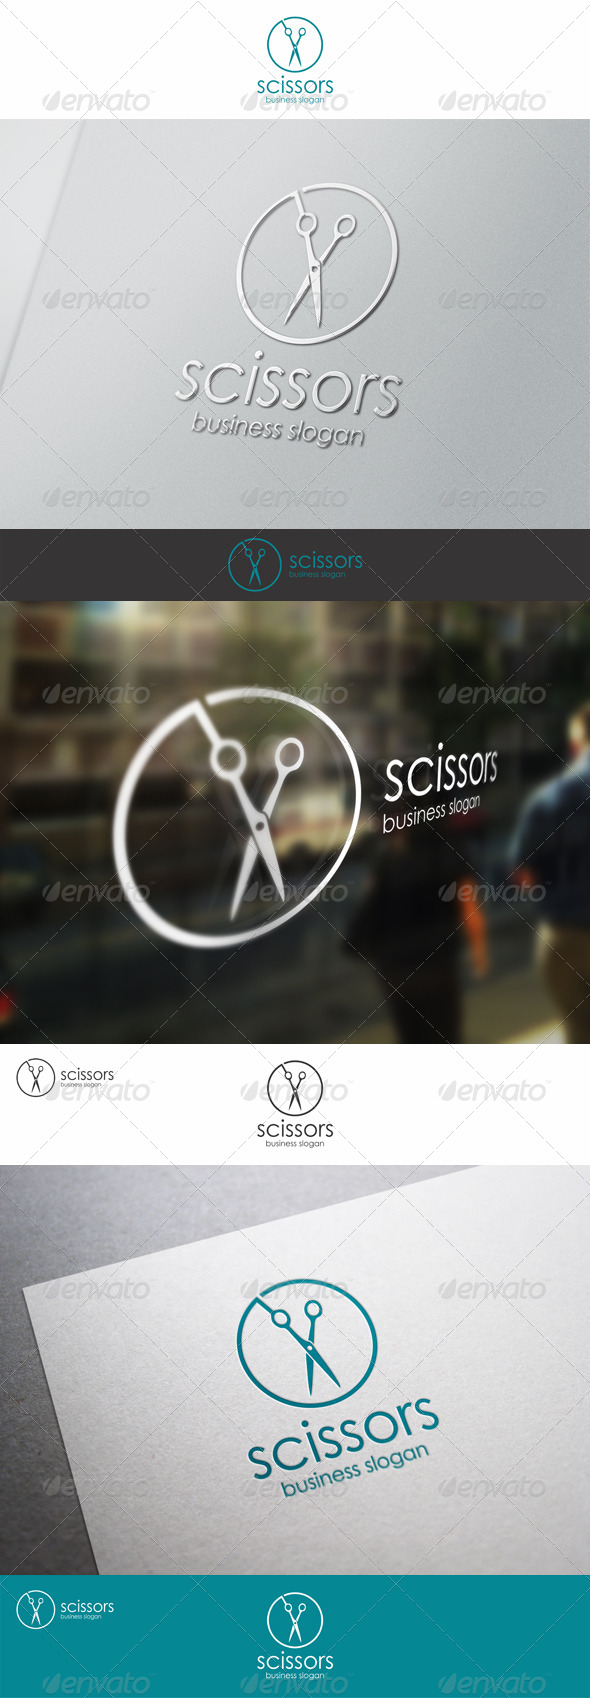 Scissors - Barber Shop Logo Template